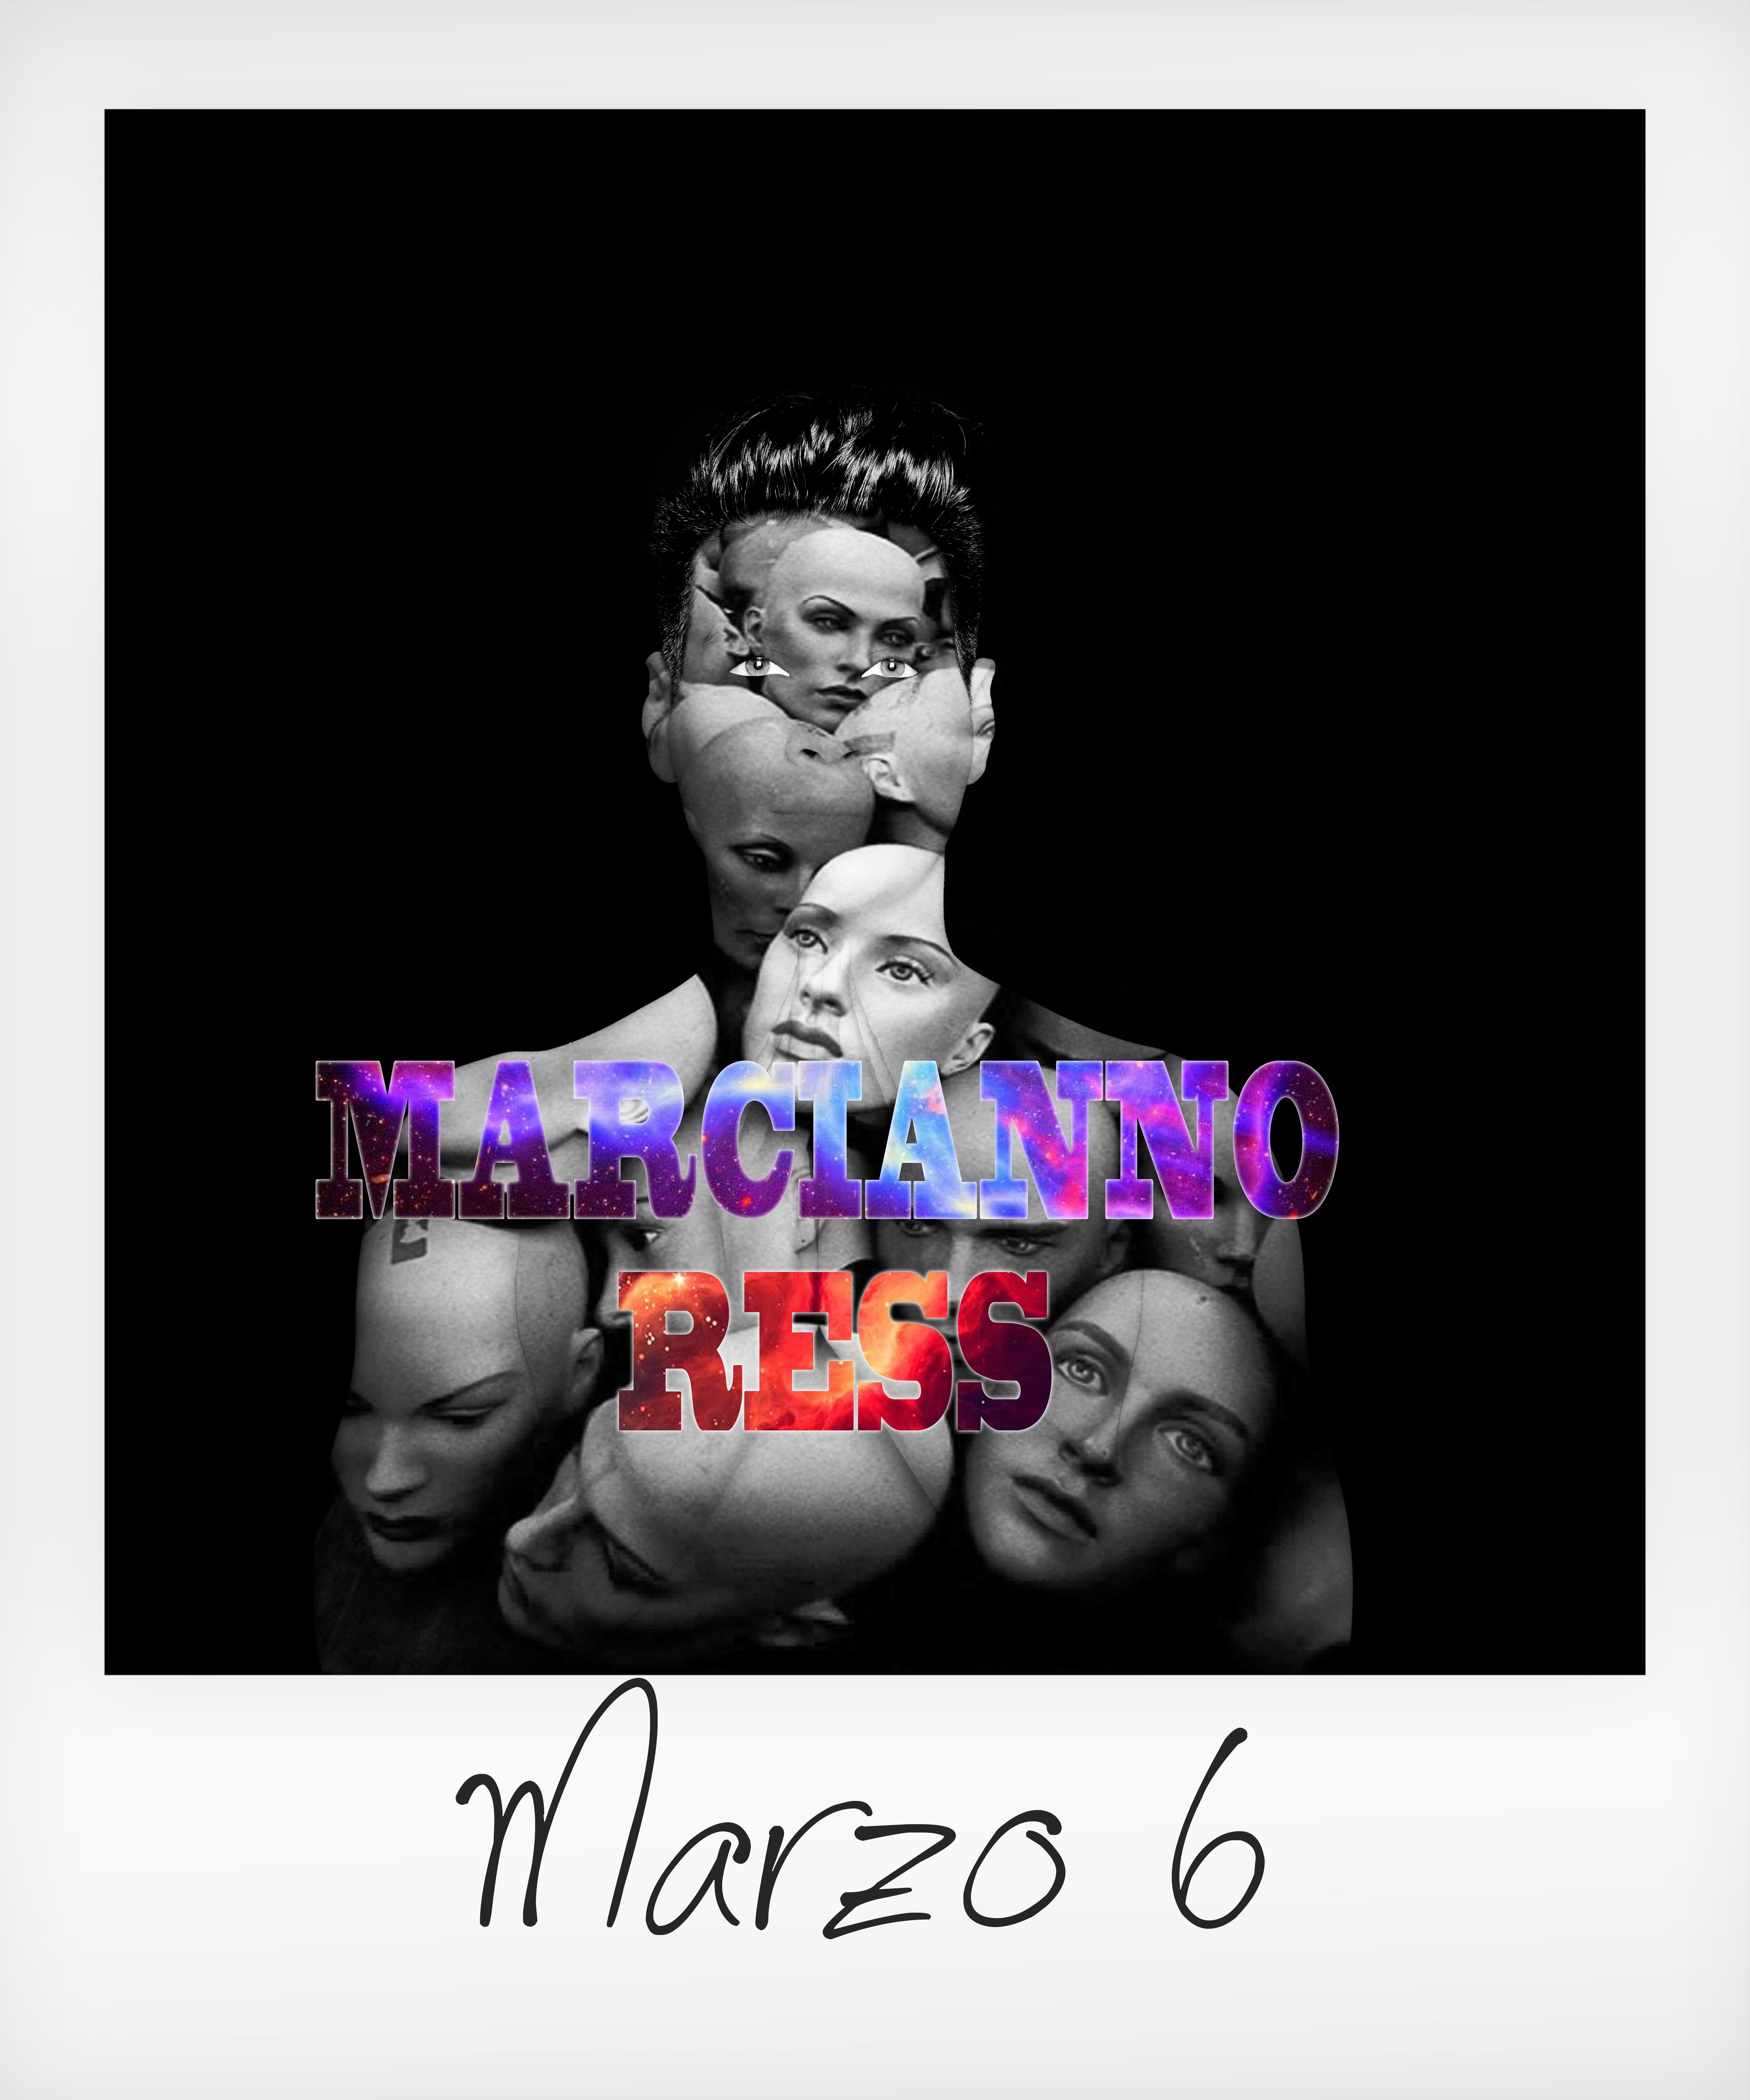 marzo 7 @Ress Marcianno